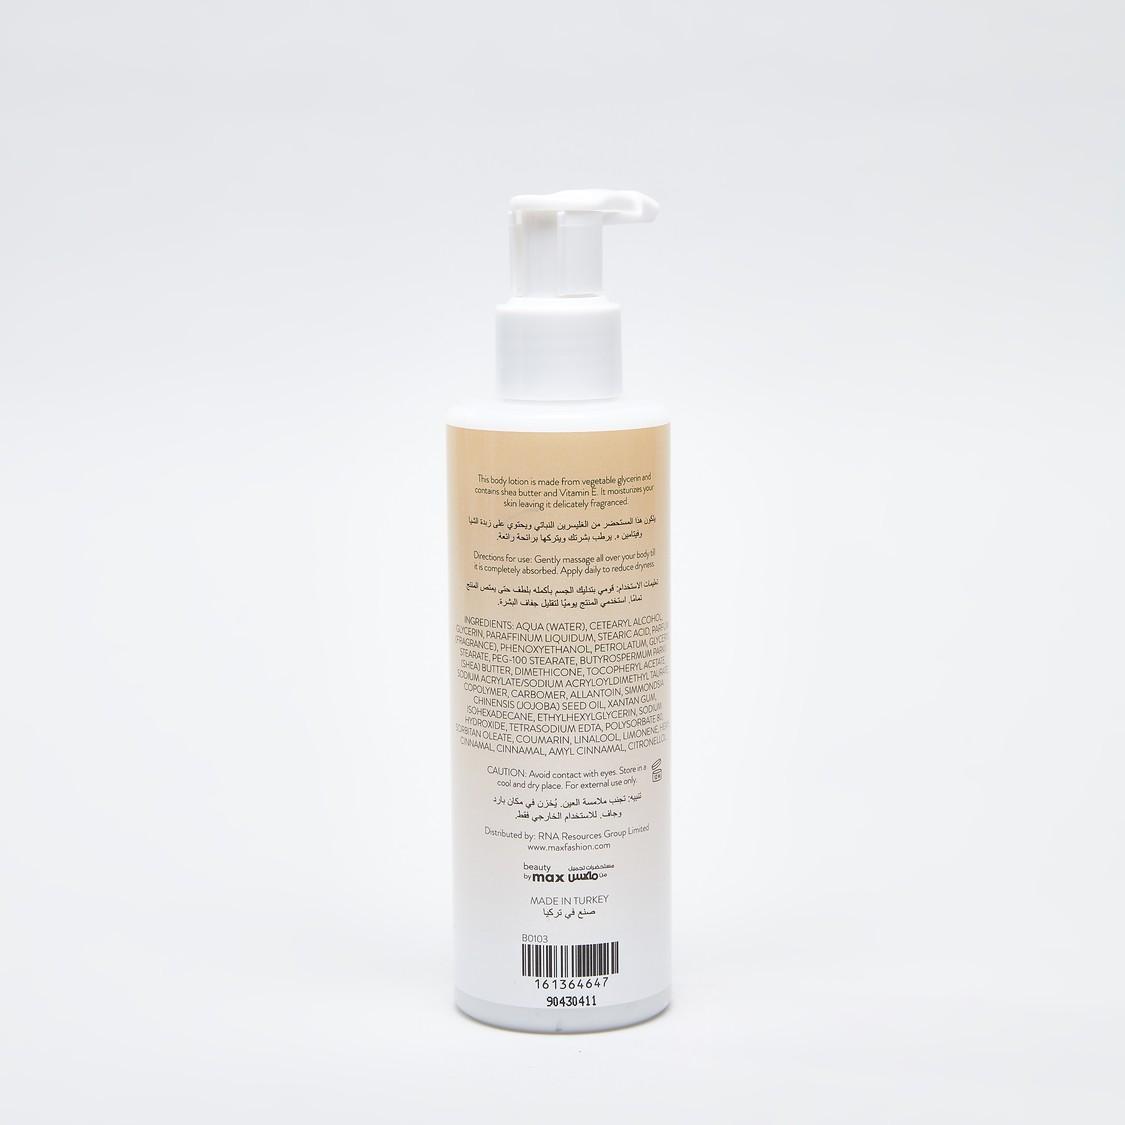 Fruit Essence Creamy Coconut Crush Moisturizing Body Lotion - 200 ml